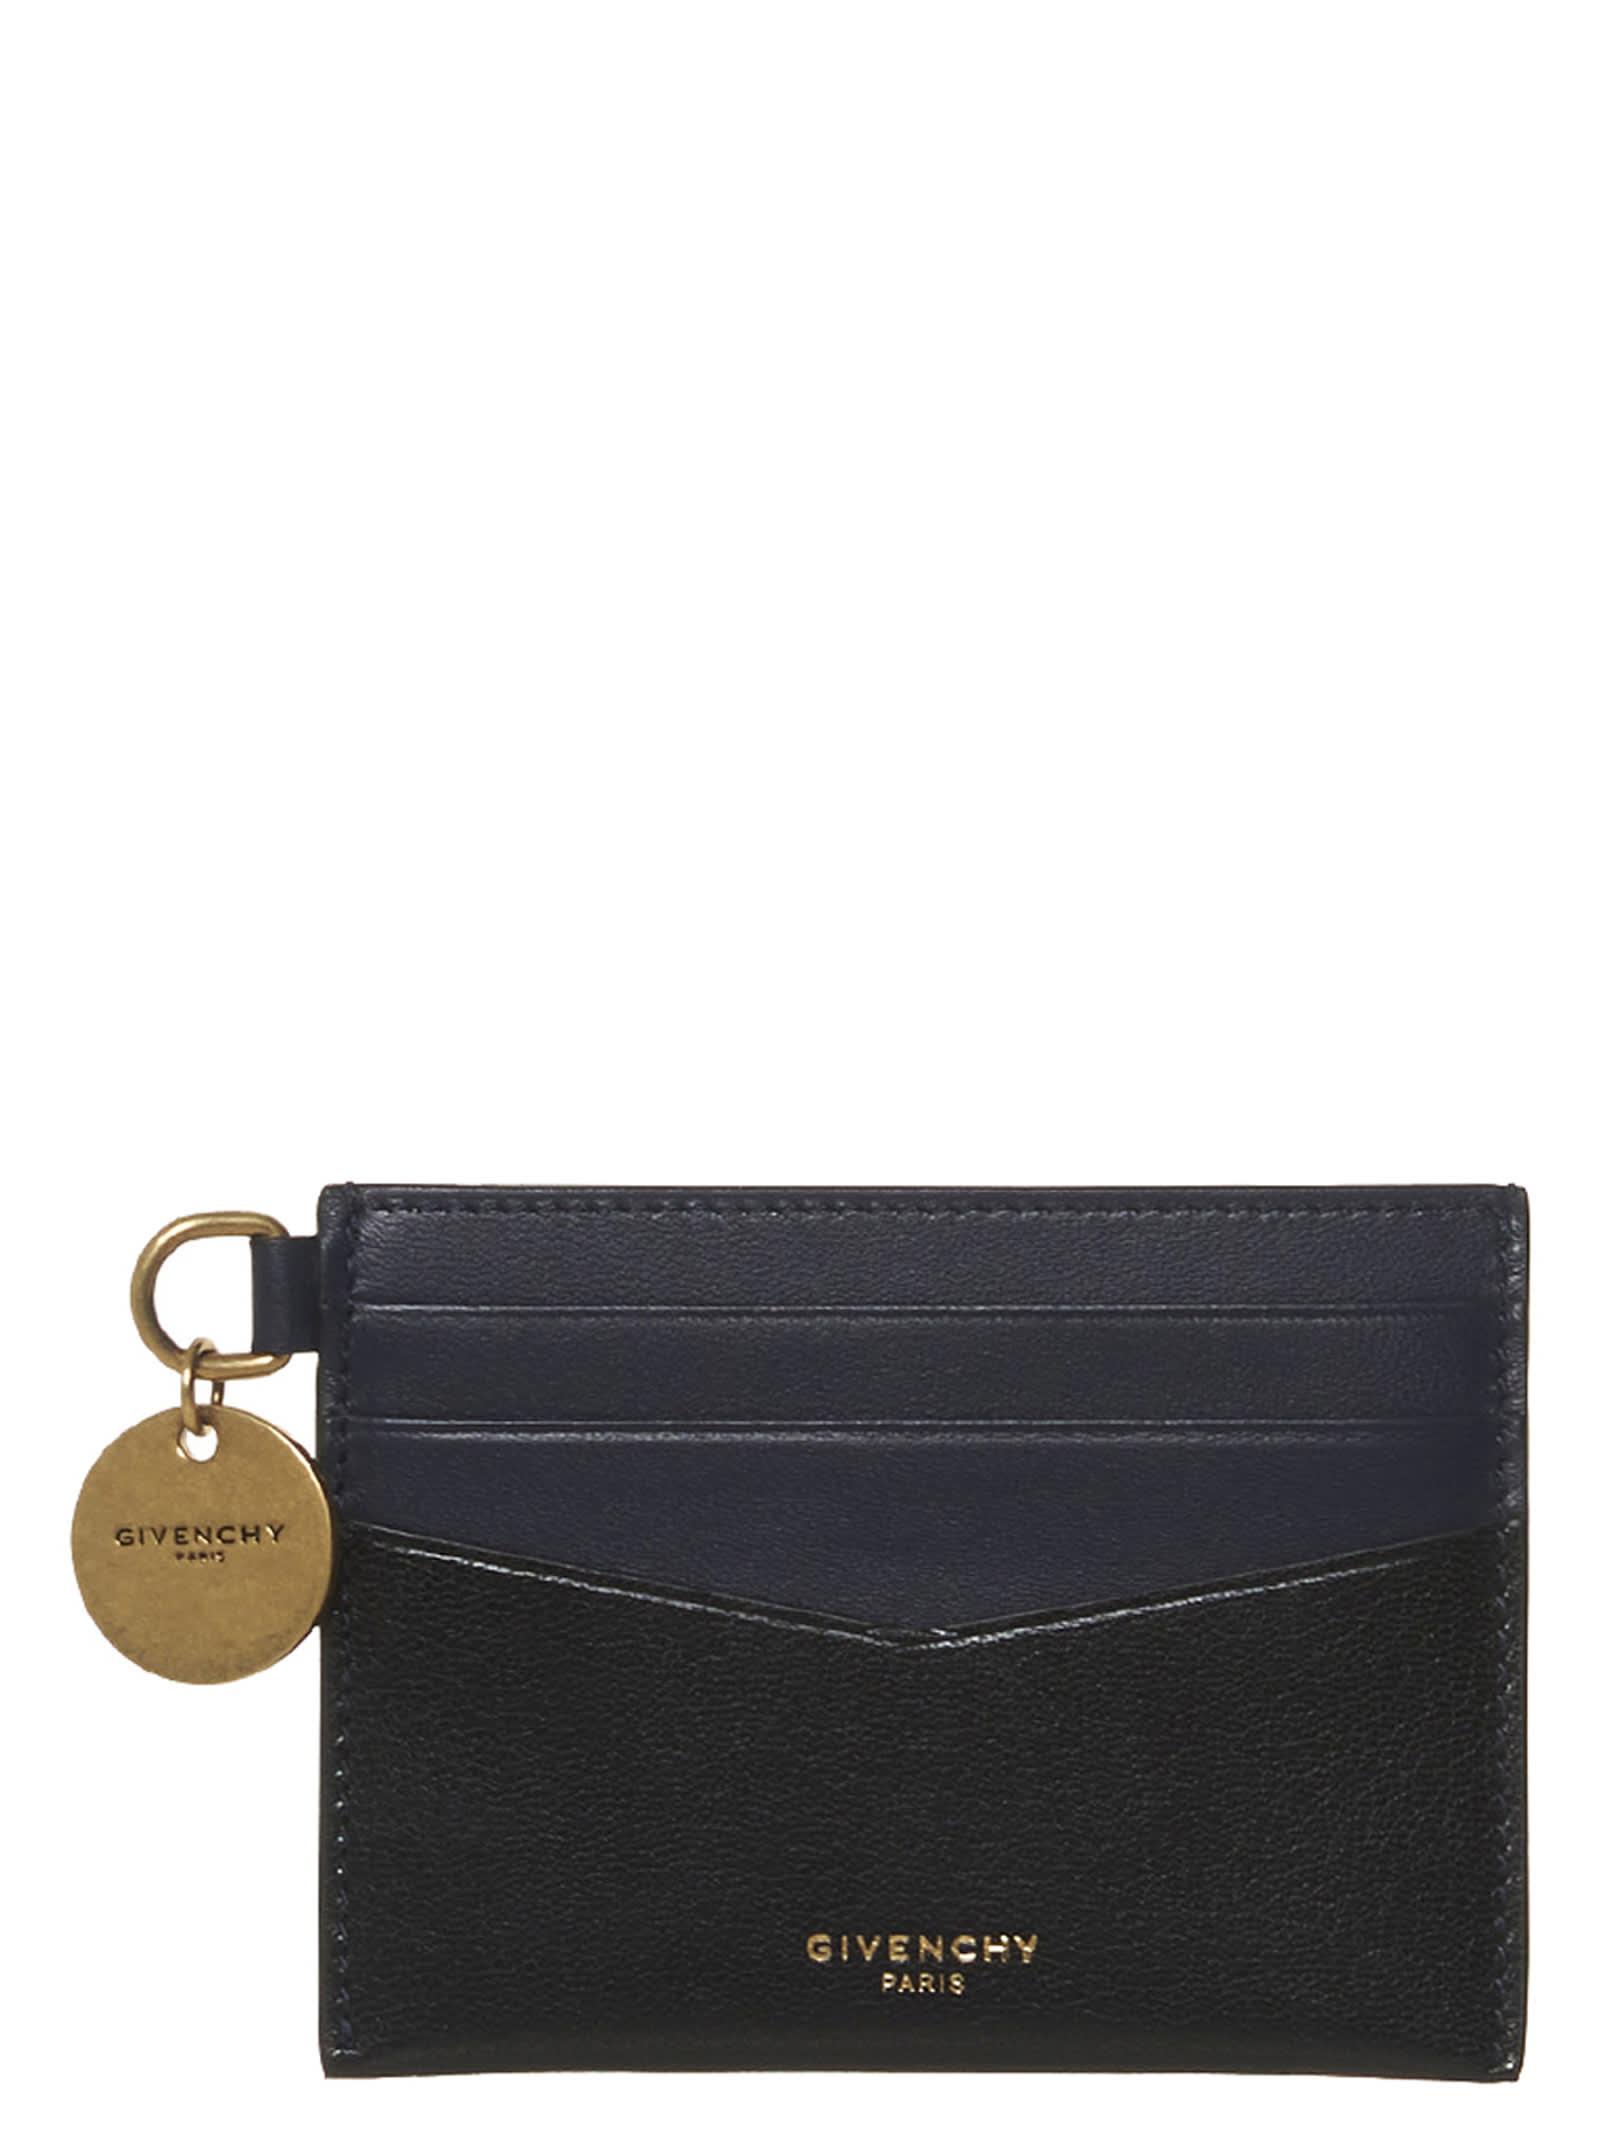 Givenchy edge Cardholder